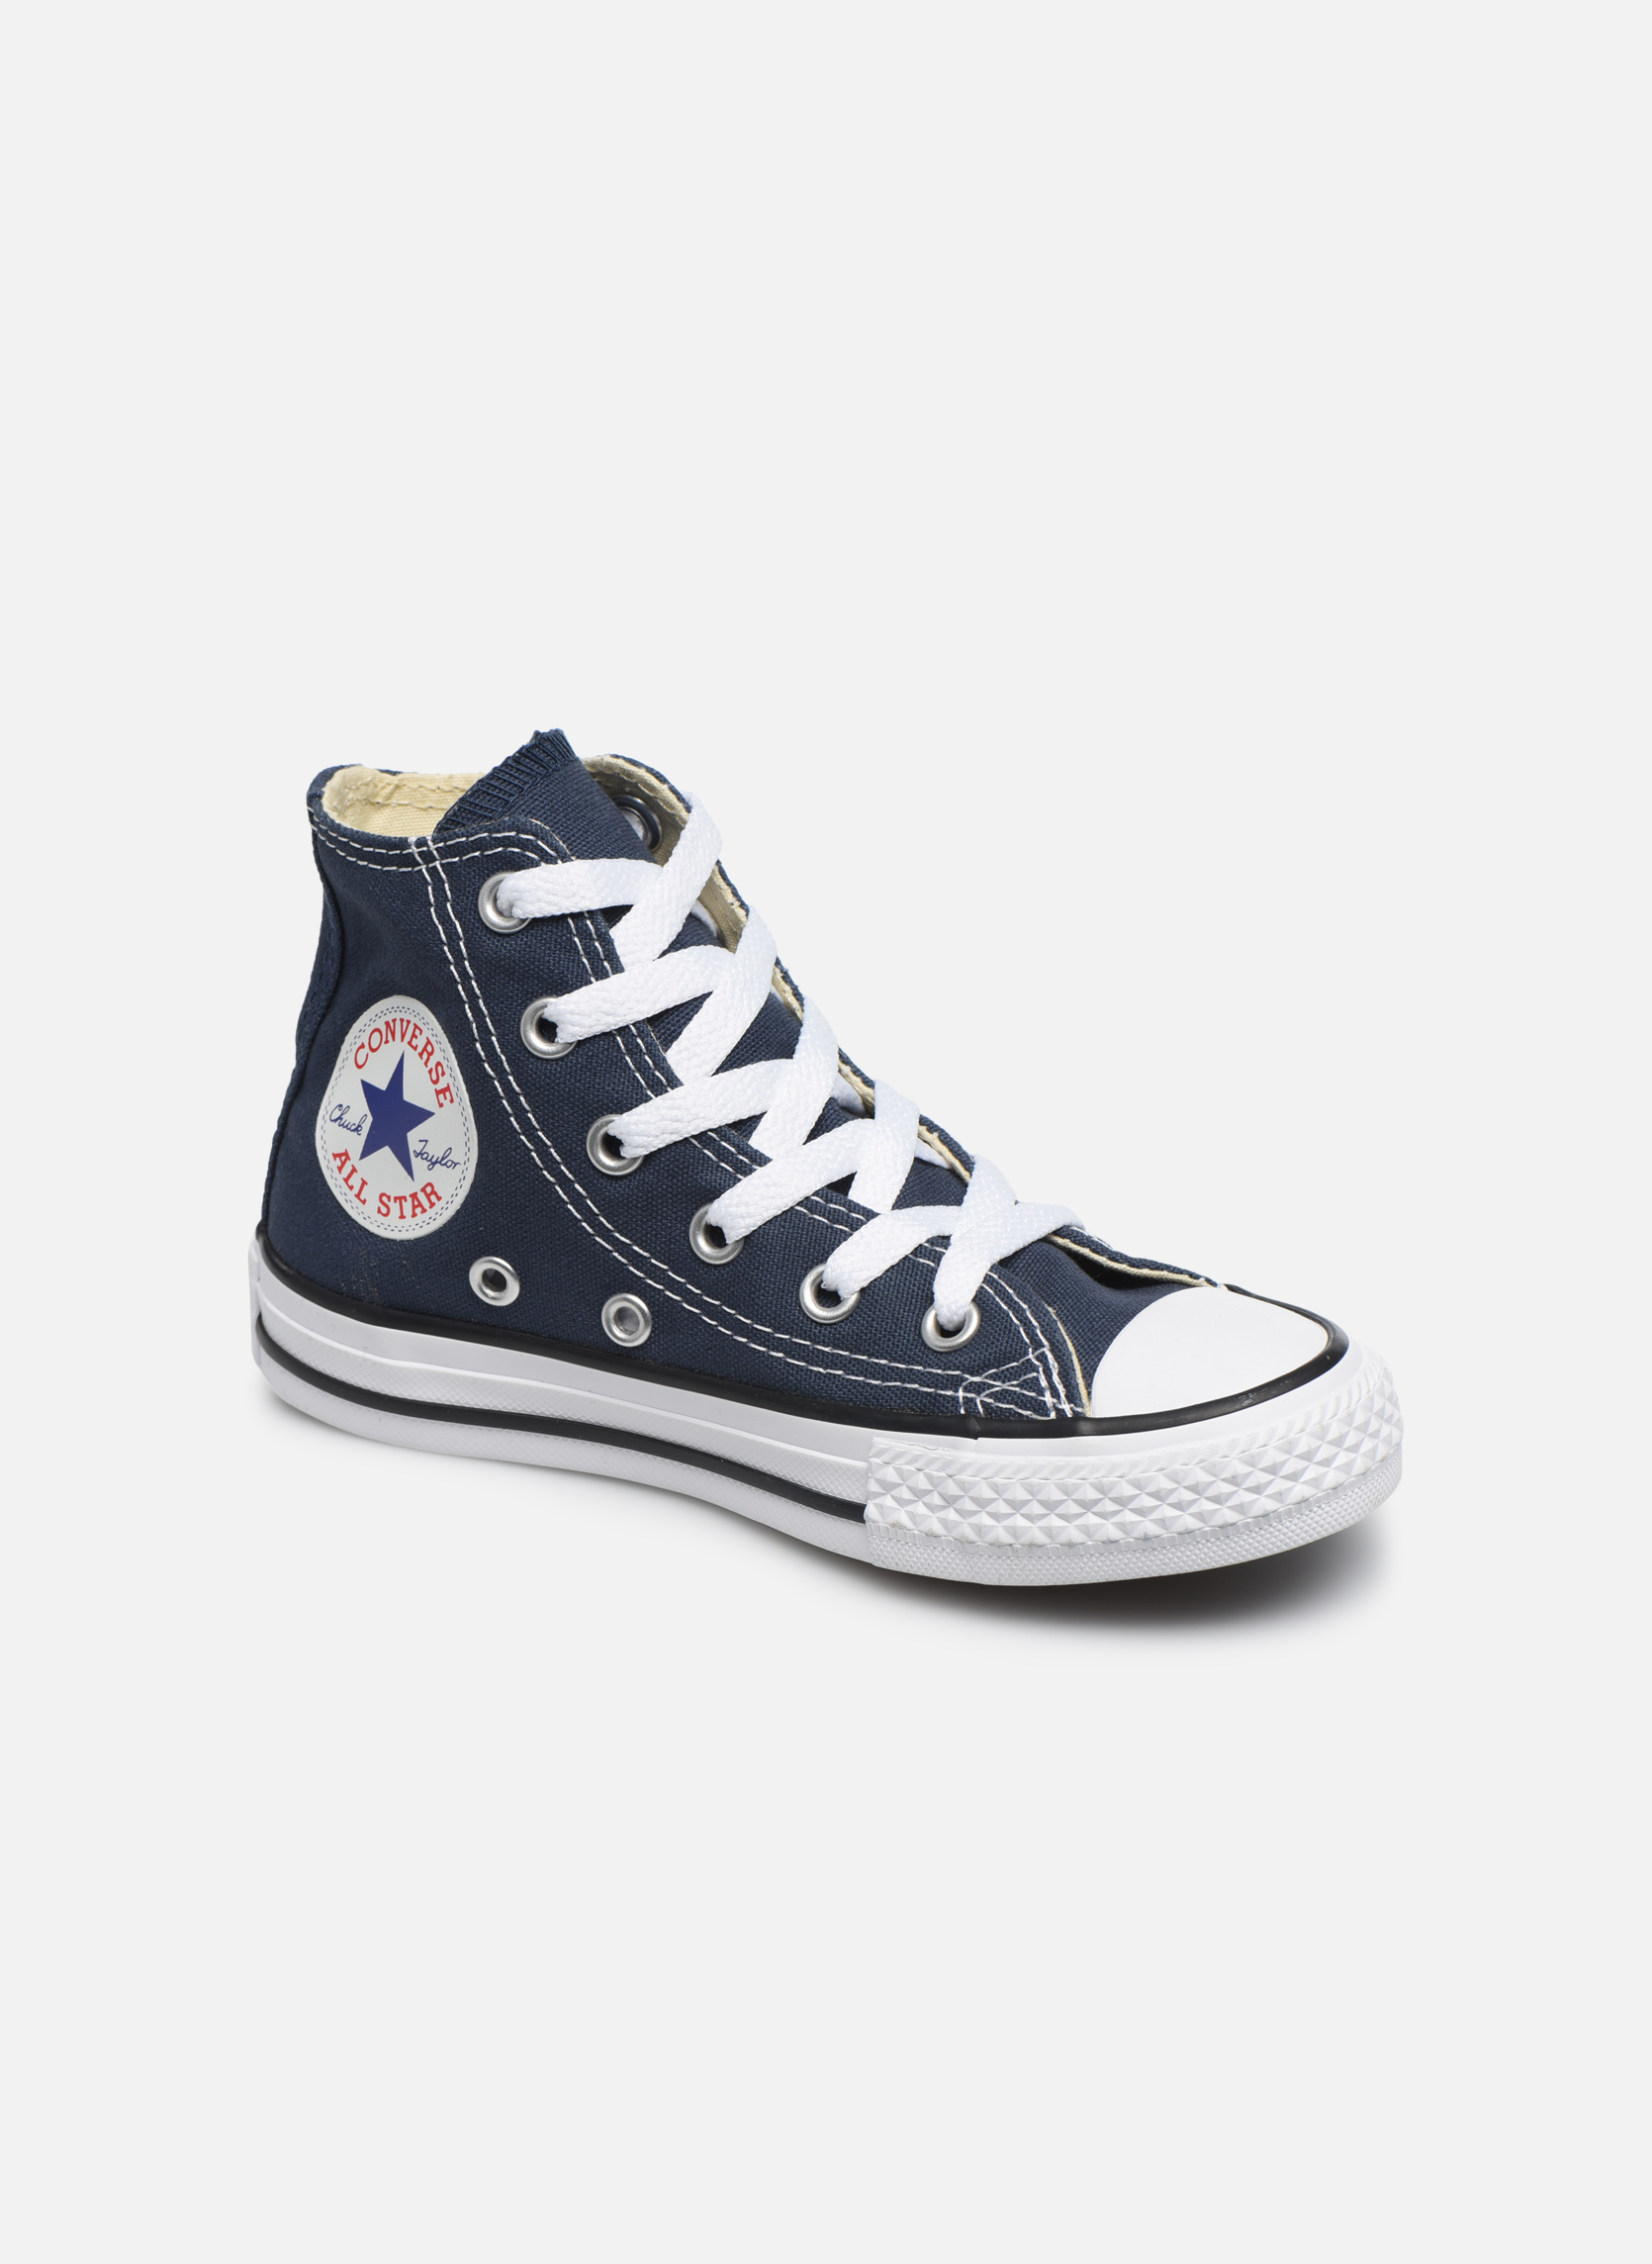 all star converse bambina 2016